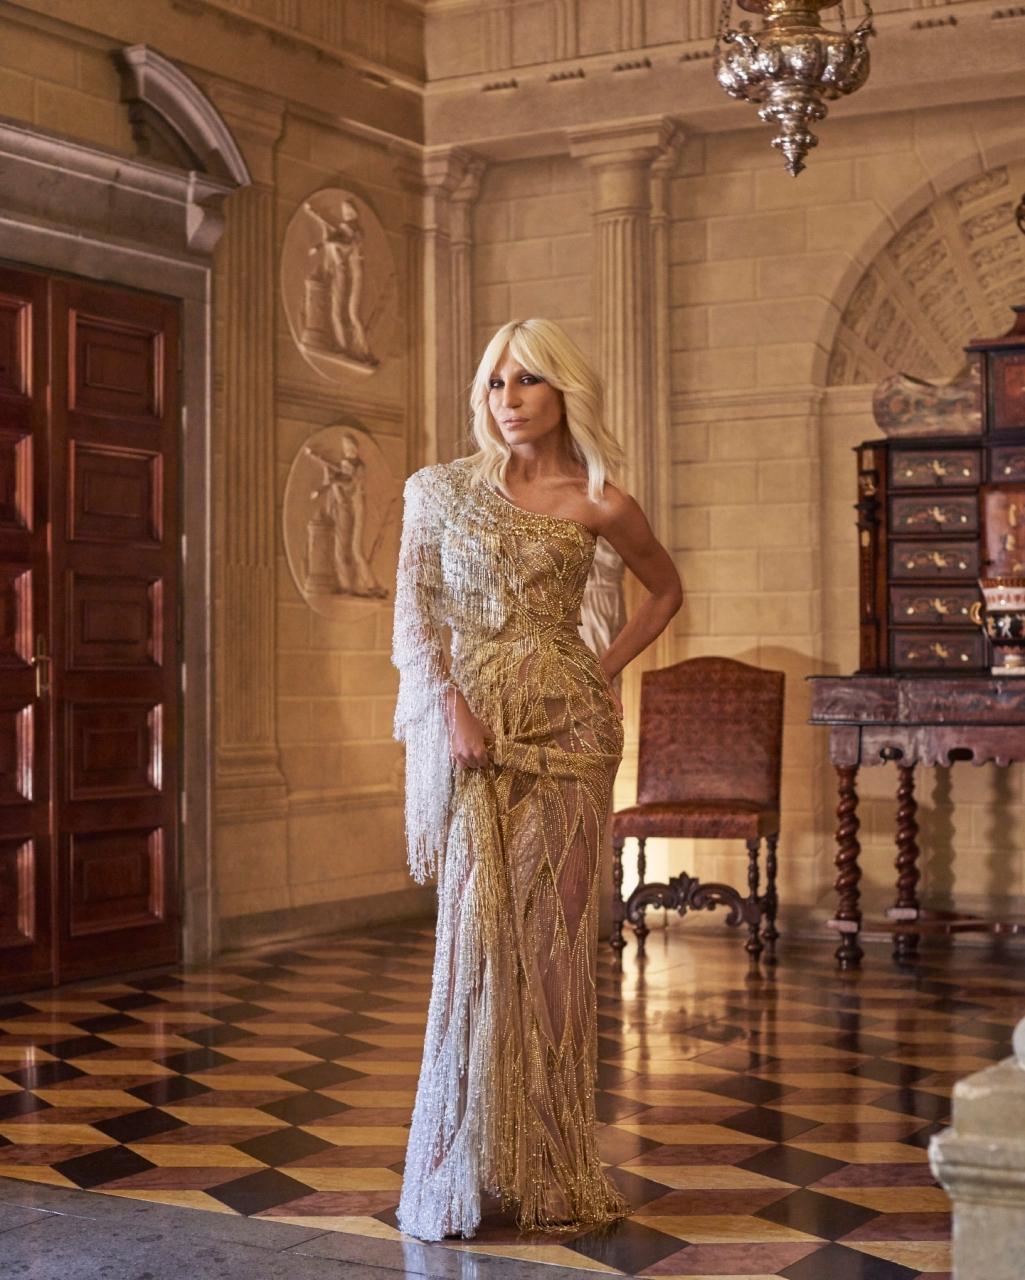 Donatella Versace By Mariano Vivanco for GQ China